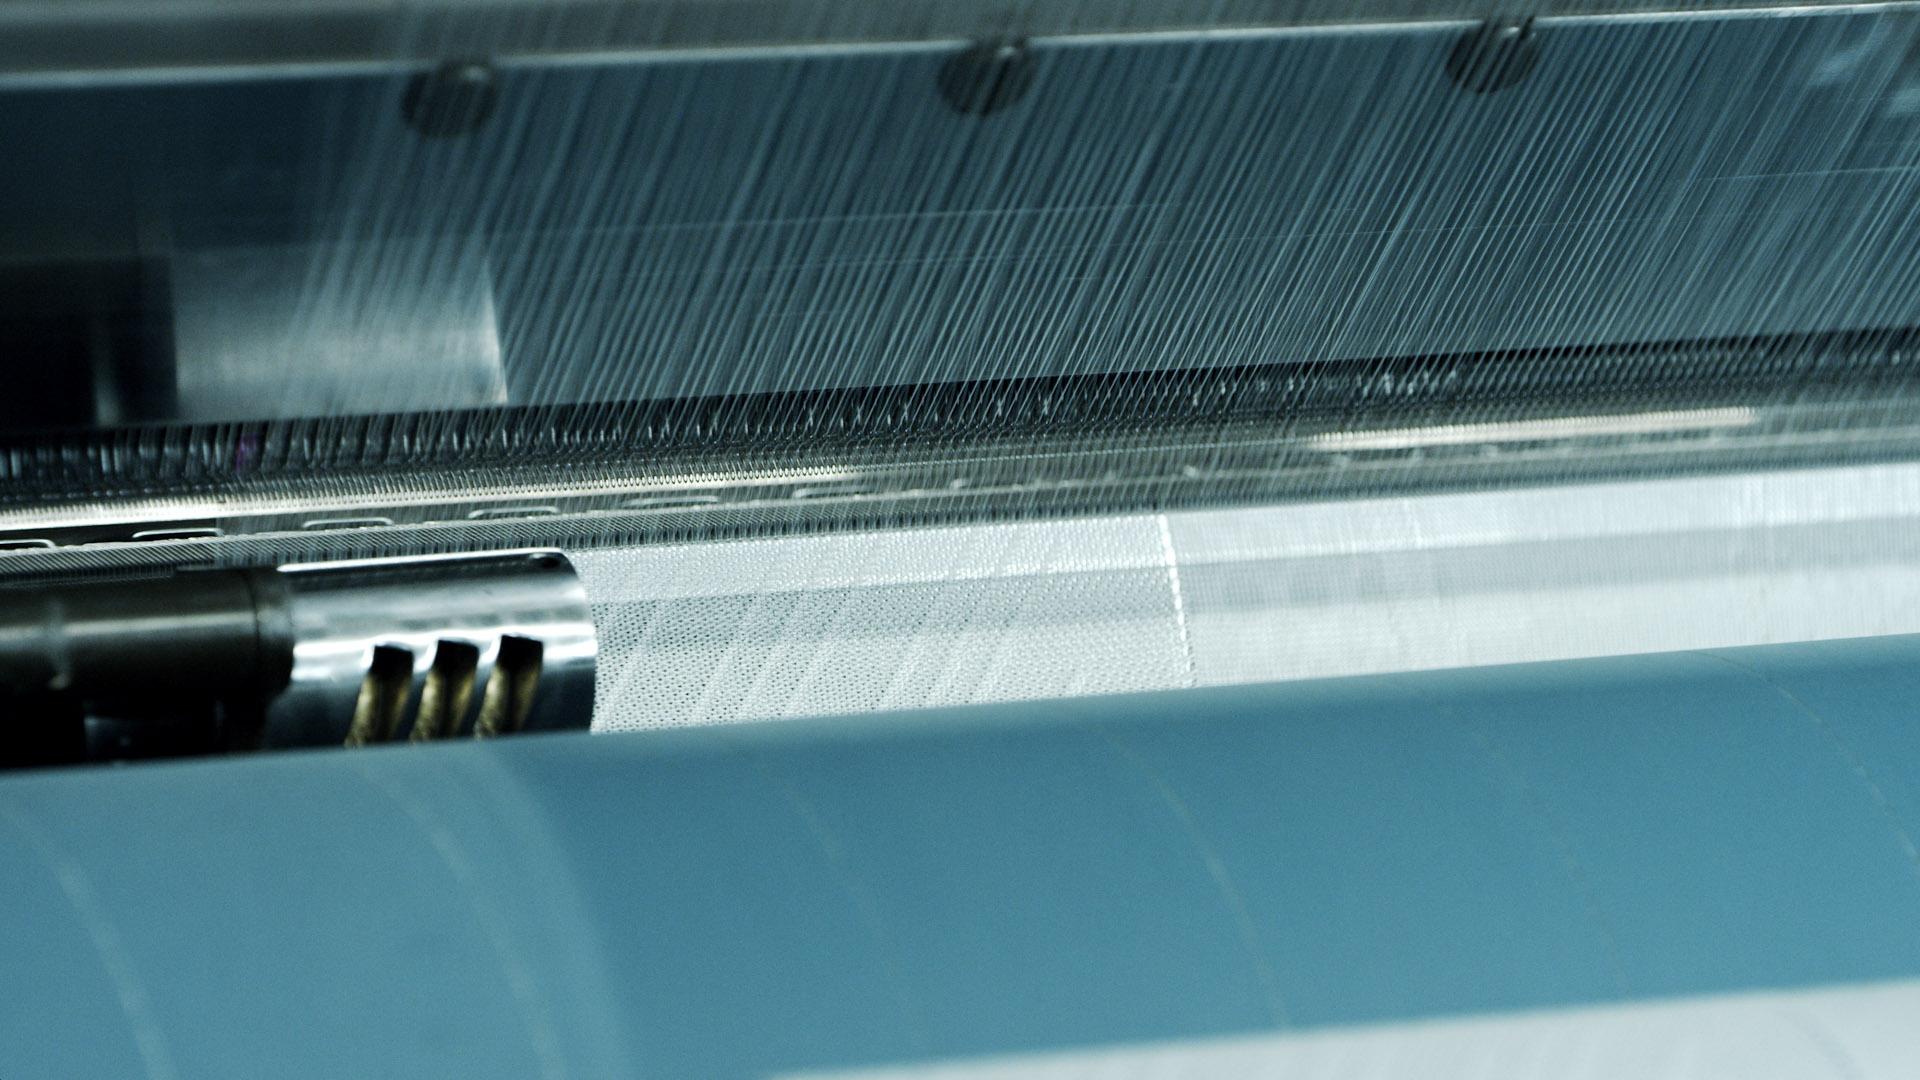 Karl-Mayer-Texture-Machine-Production-Textile_14.jpg